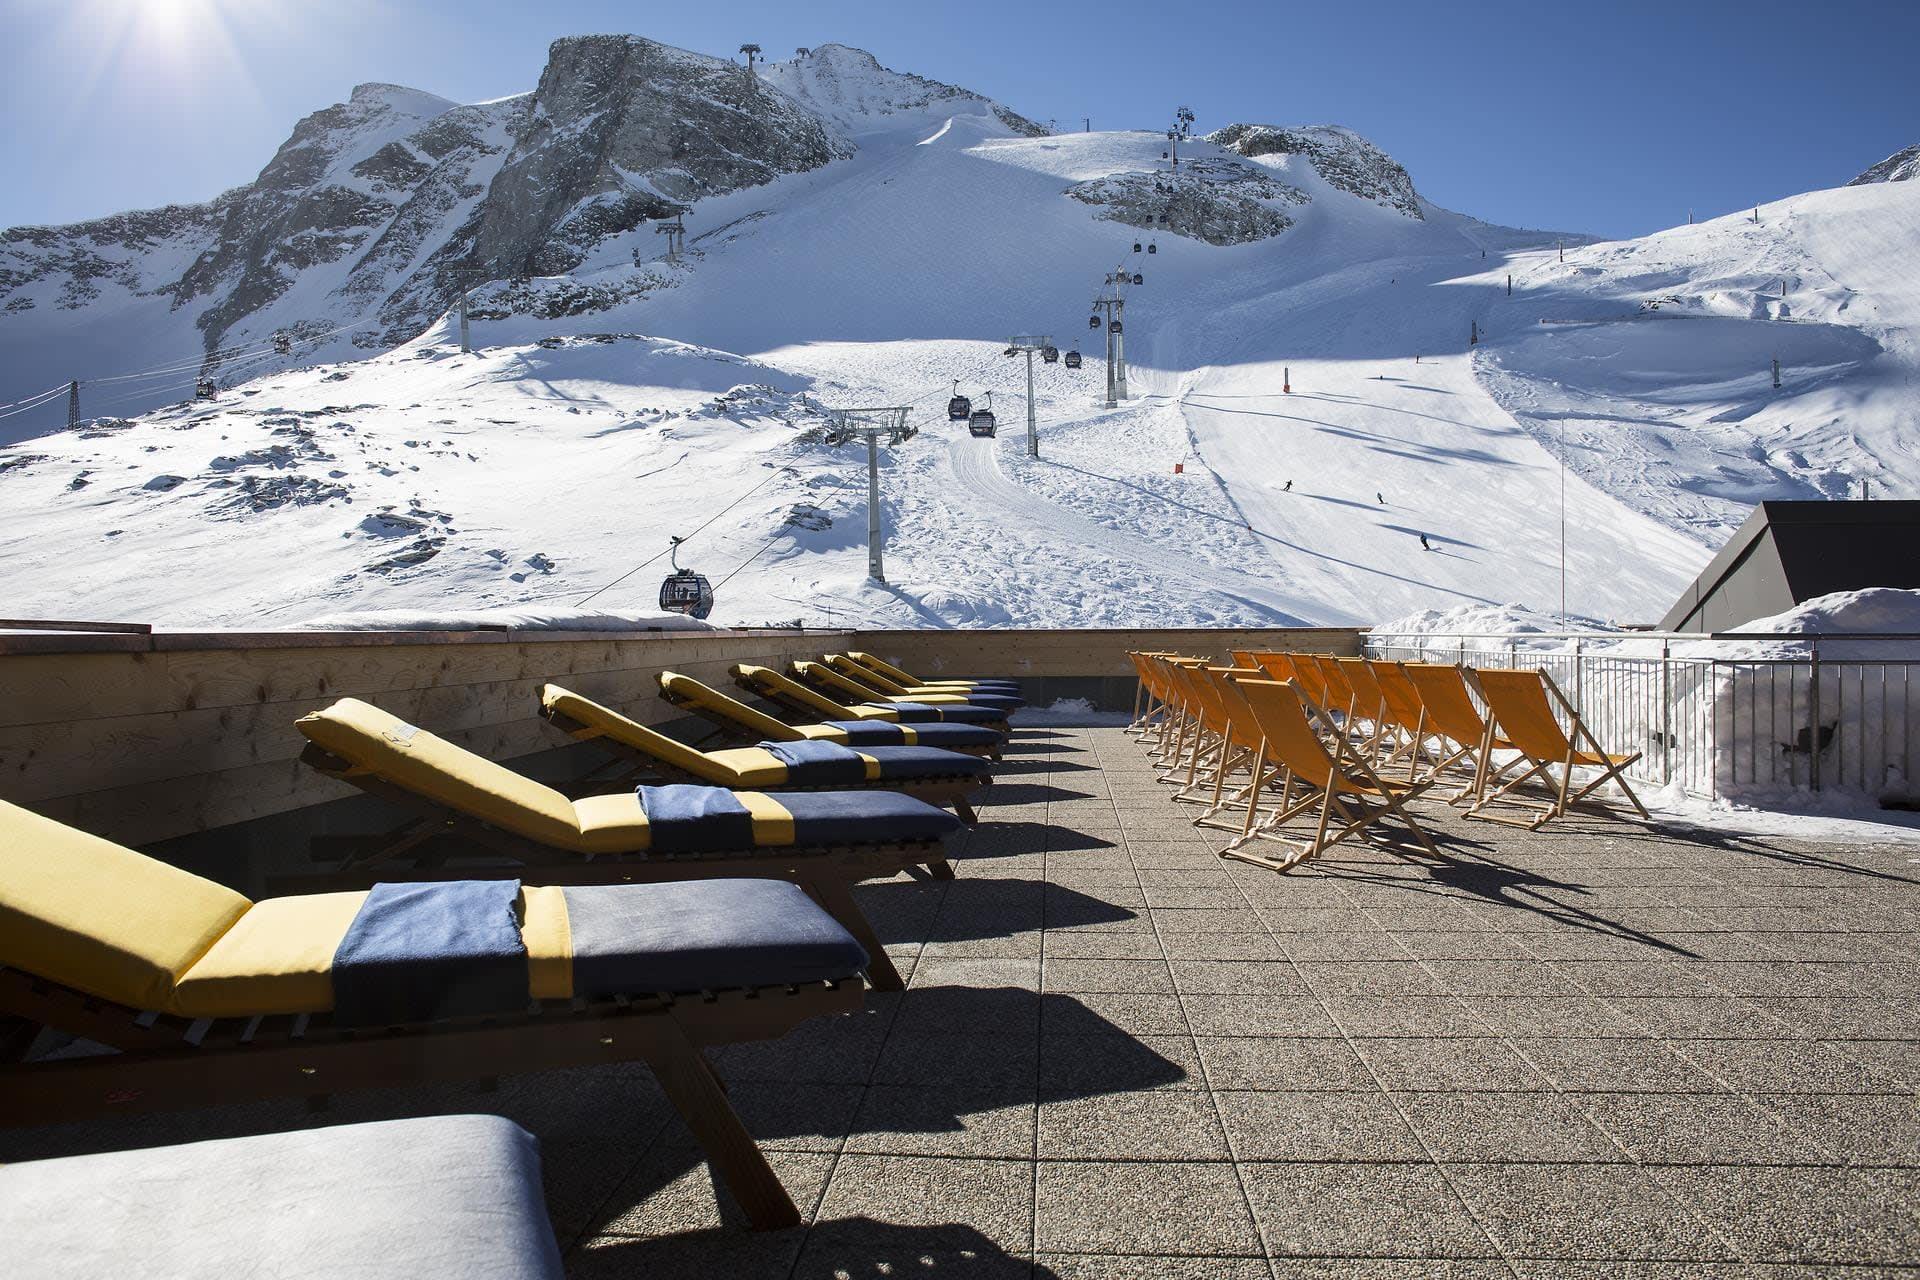 Sun terrace at the Fernerhaus on the Hintertux Glacier